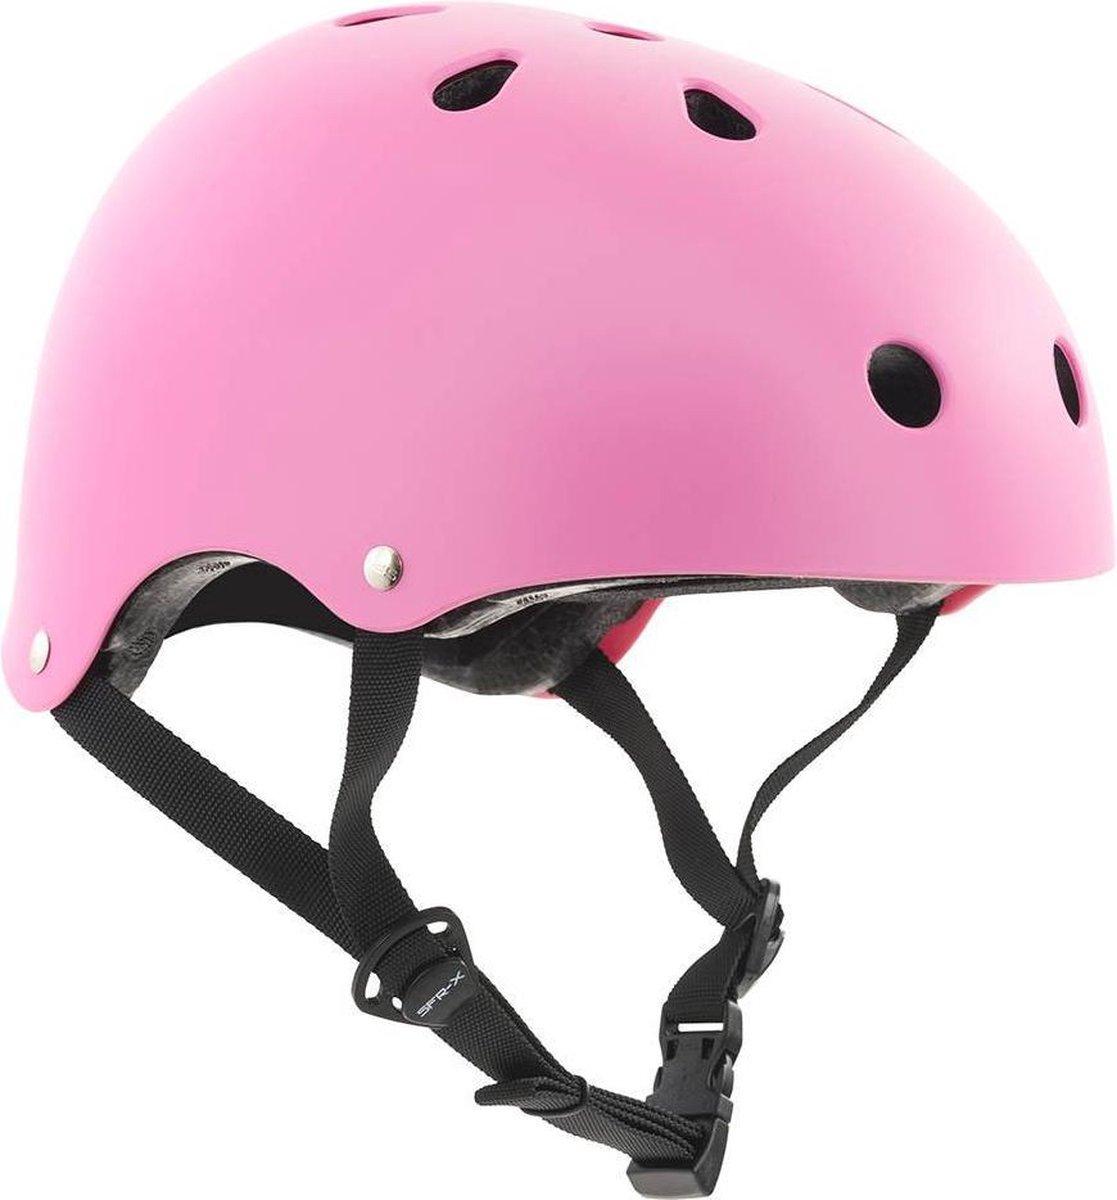 SFR Essentials Skate/BMX helm Helm - UnisexKinderen en volwassenen - roze Maat S/M: 53-56cm